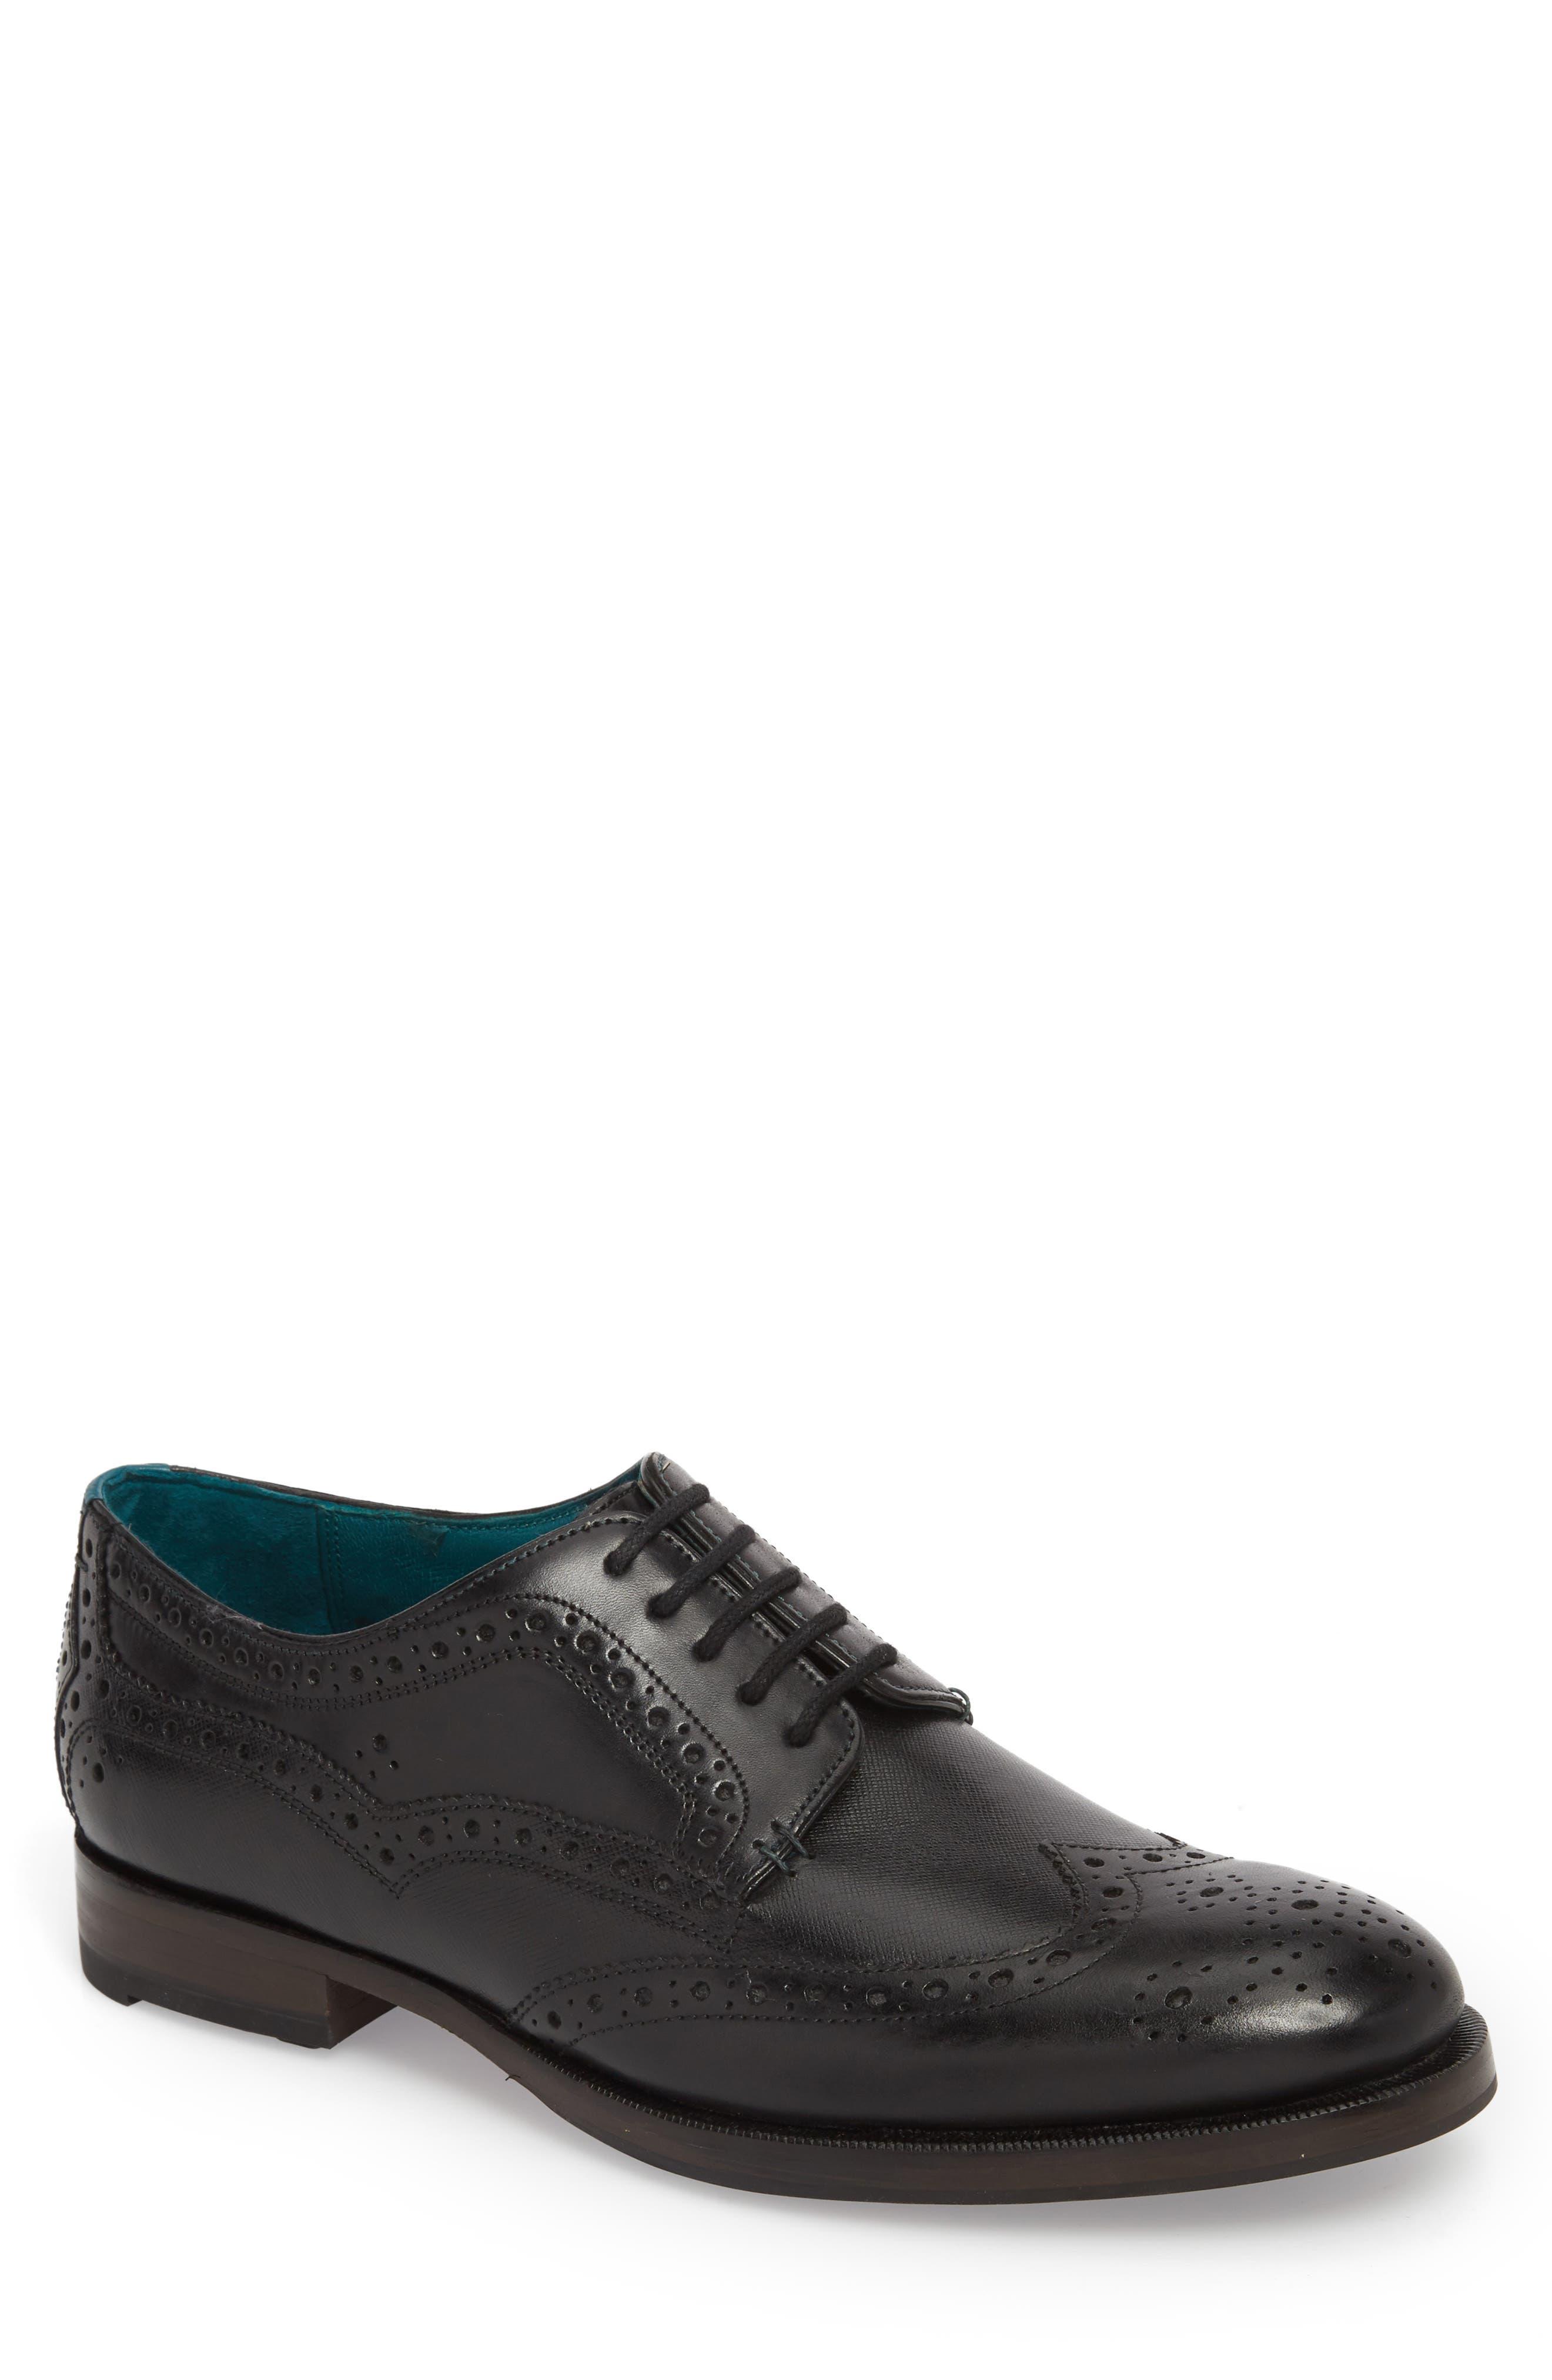 Senape Wingtip,                             Main thumbnail 1, color,                             Black Leather